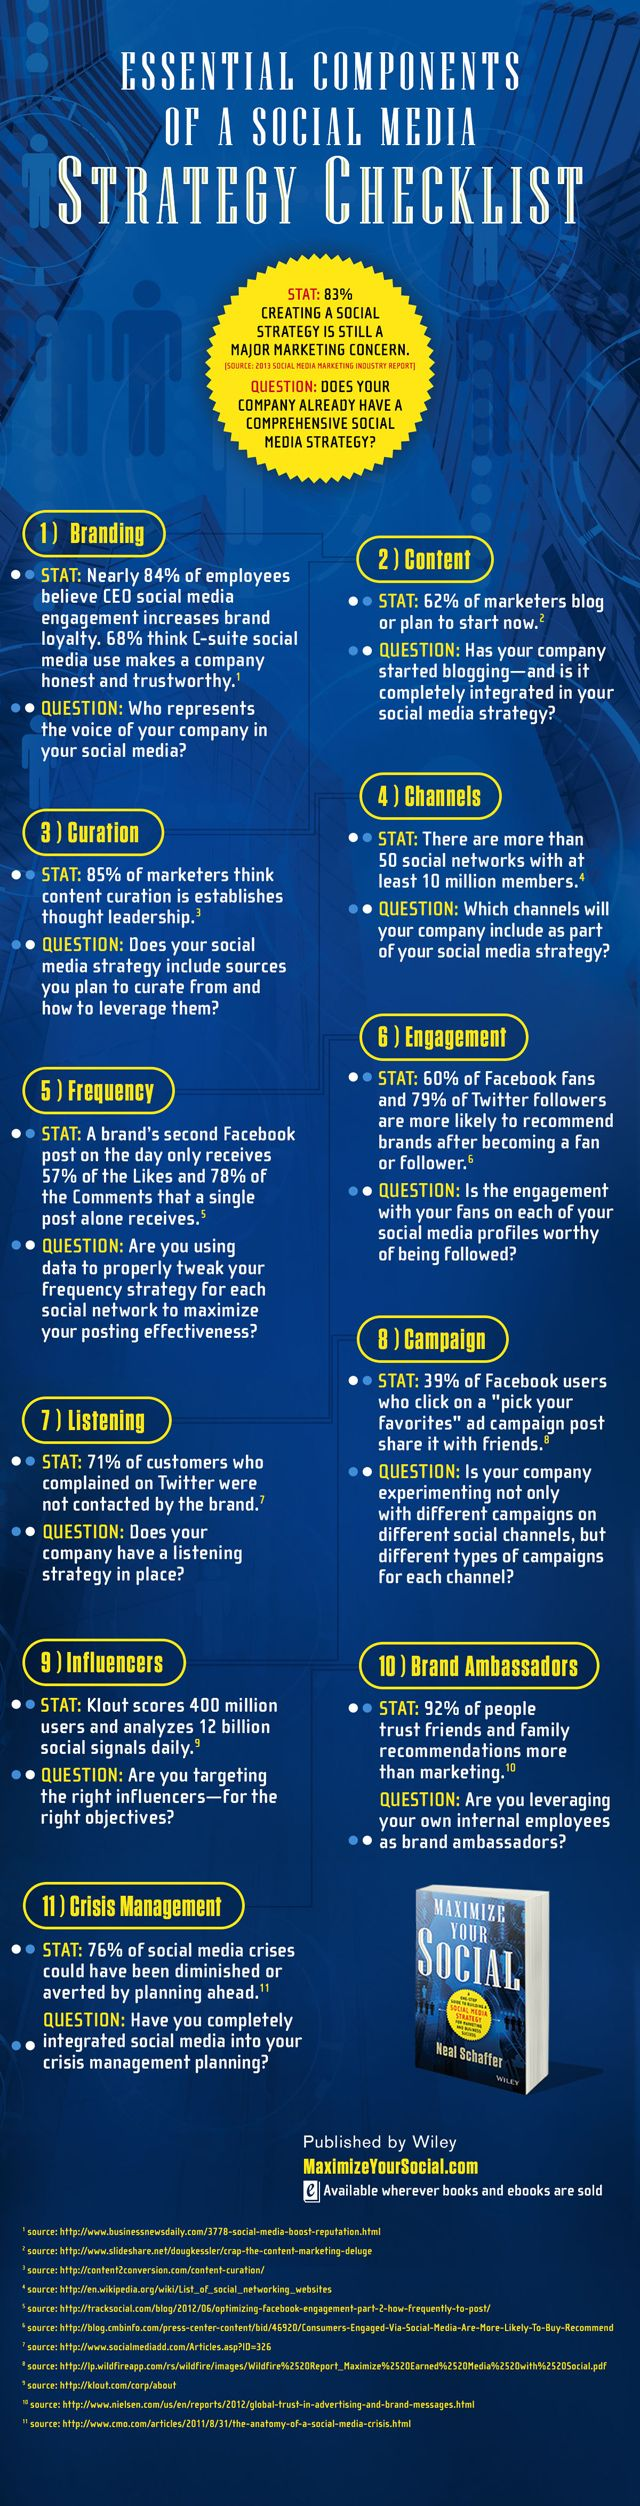 Essential Components of A Social Media Strategy Checklist [INFOGRAPHIC] #SocialMedia #Marketing #SMM